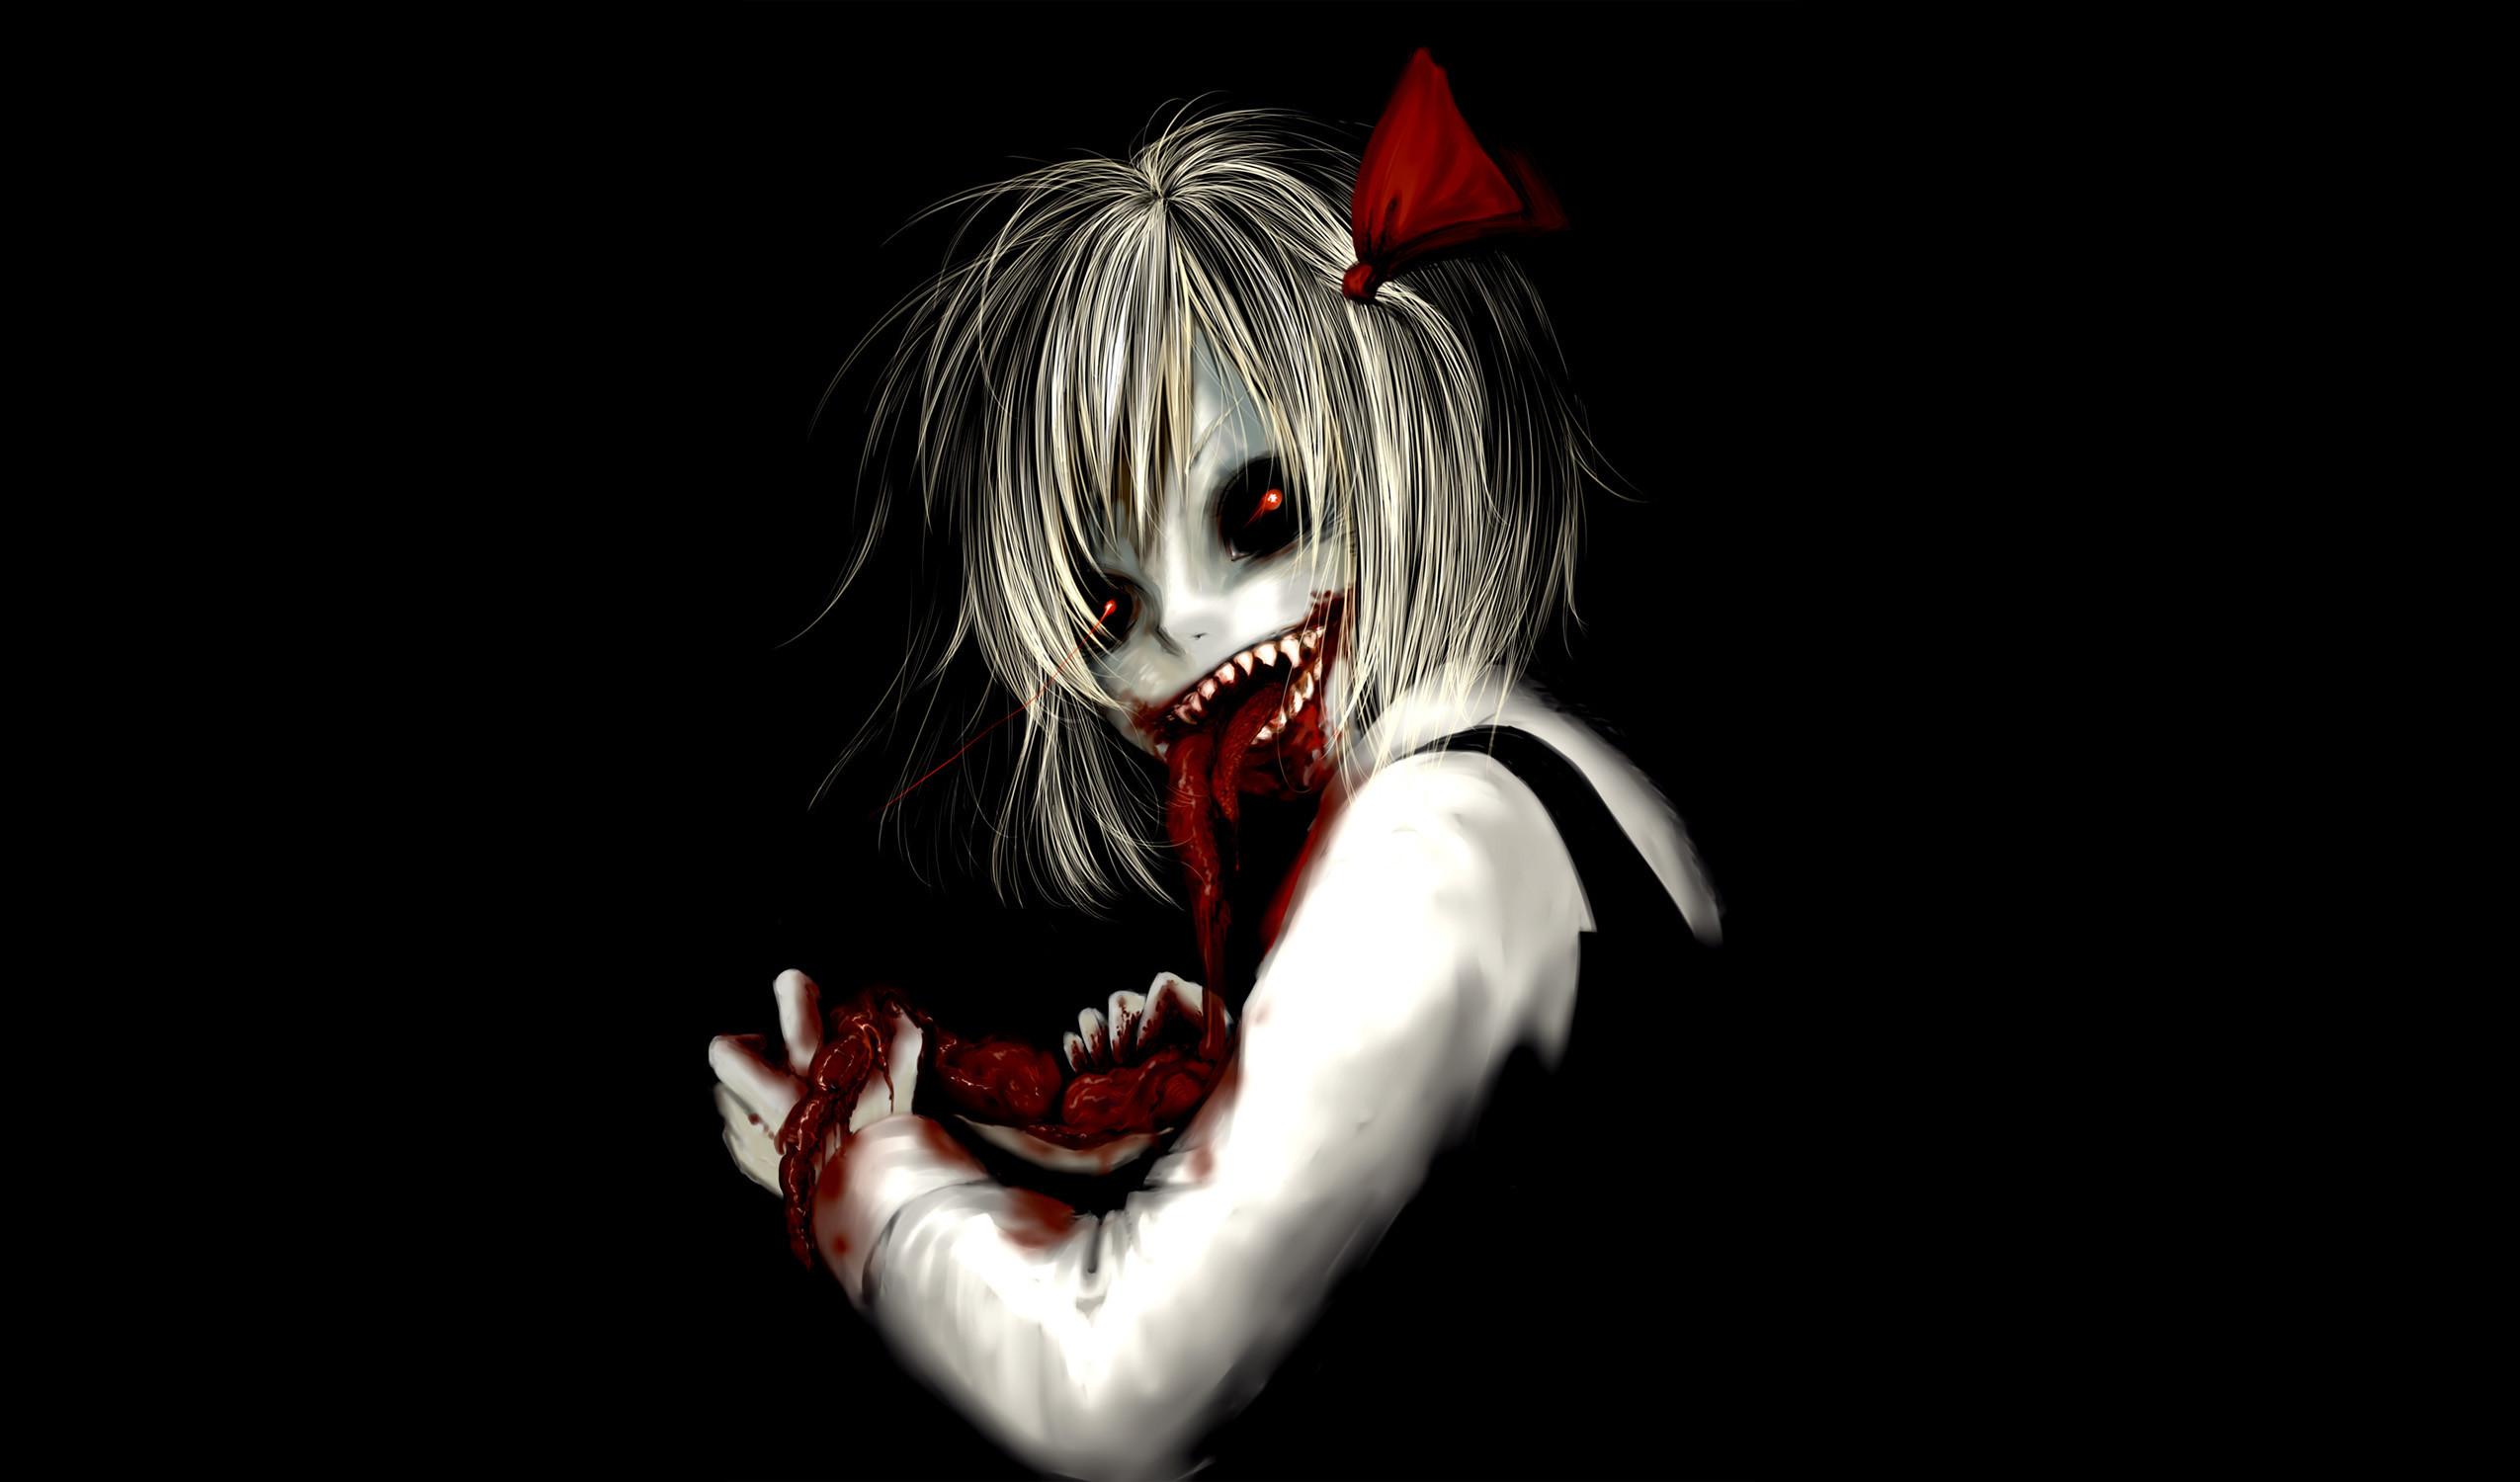 Dark Horror Anime Macabre Blood Guts Evil Girl Best Wallpapers .